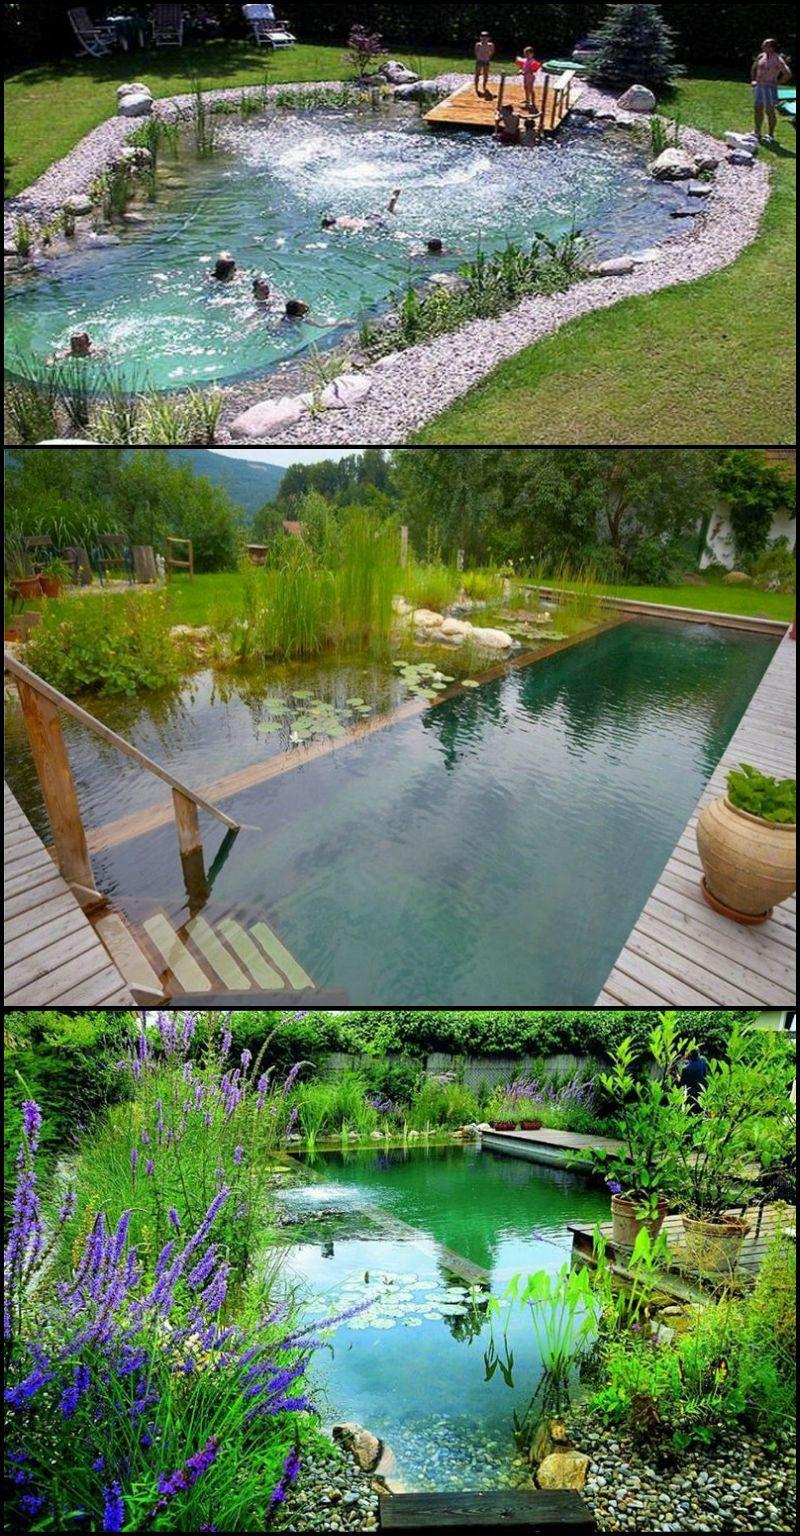 Natural Swimming Ponds, Also Called Natural Pools, Are A ... avec Accessoires Pour Bassin De Jardin